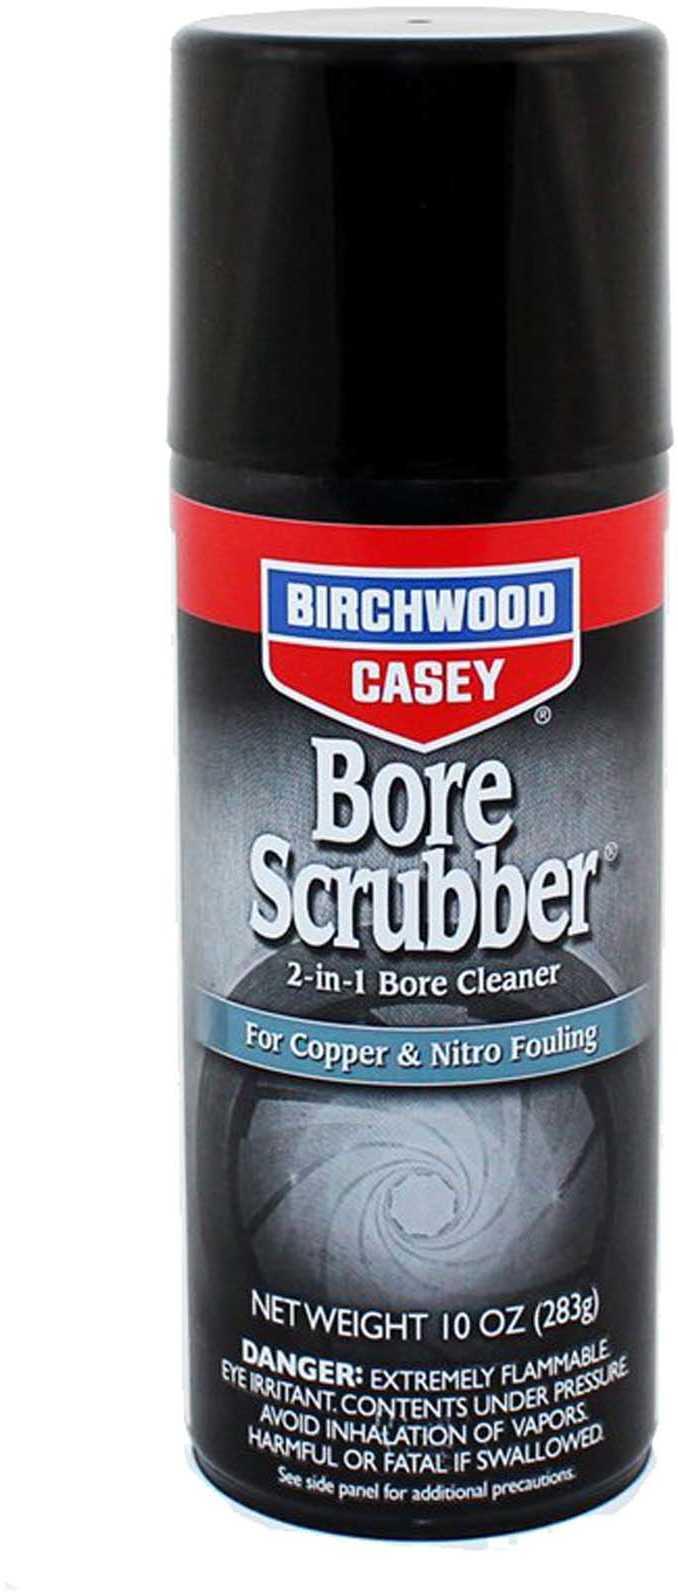 Birchwood Casey Bore Scrubber 2-In-1 Cleaner 10Oz Aerosol Md: 33640